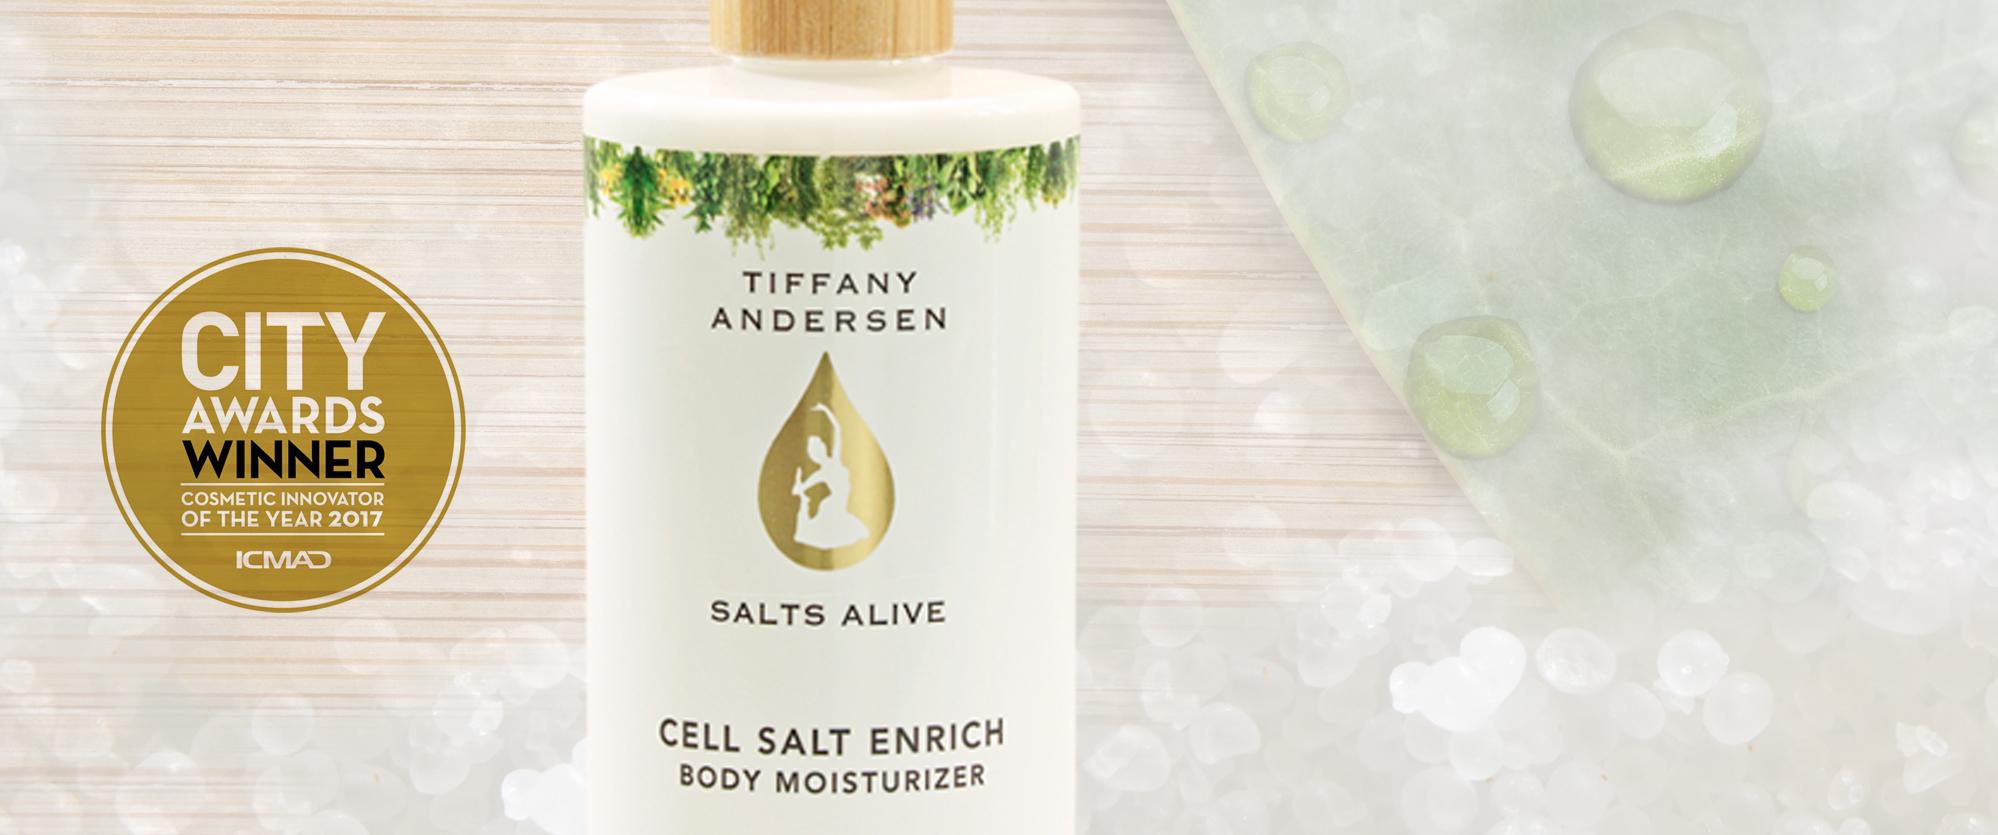 Cell Salt Enrich Header